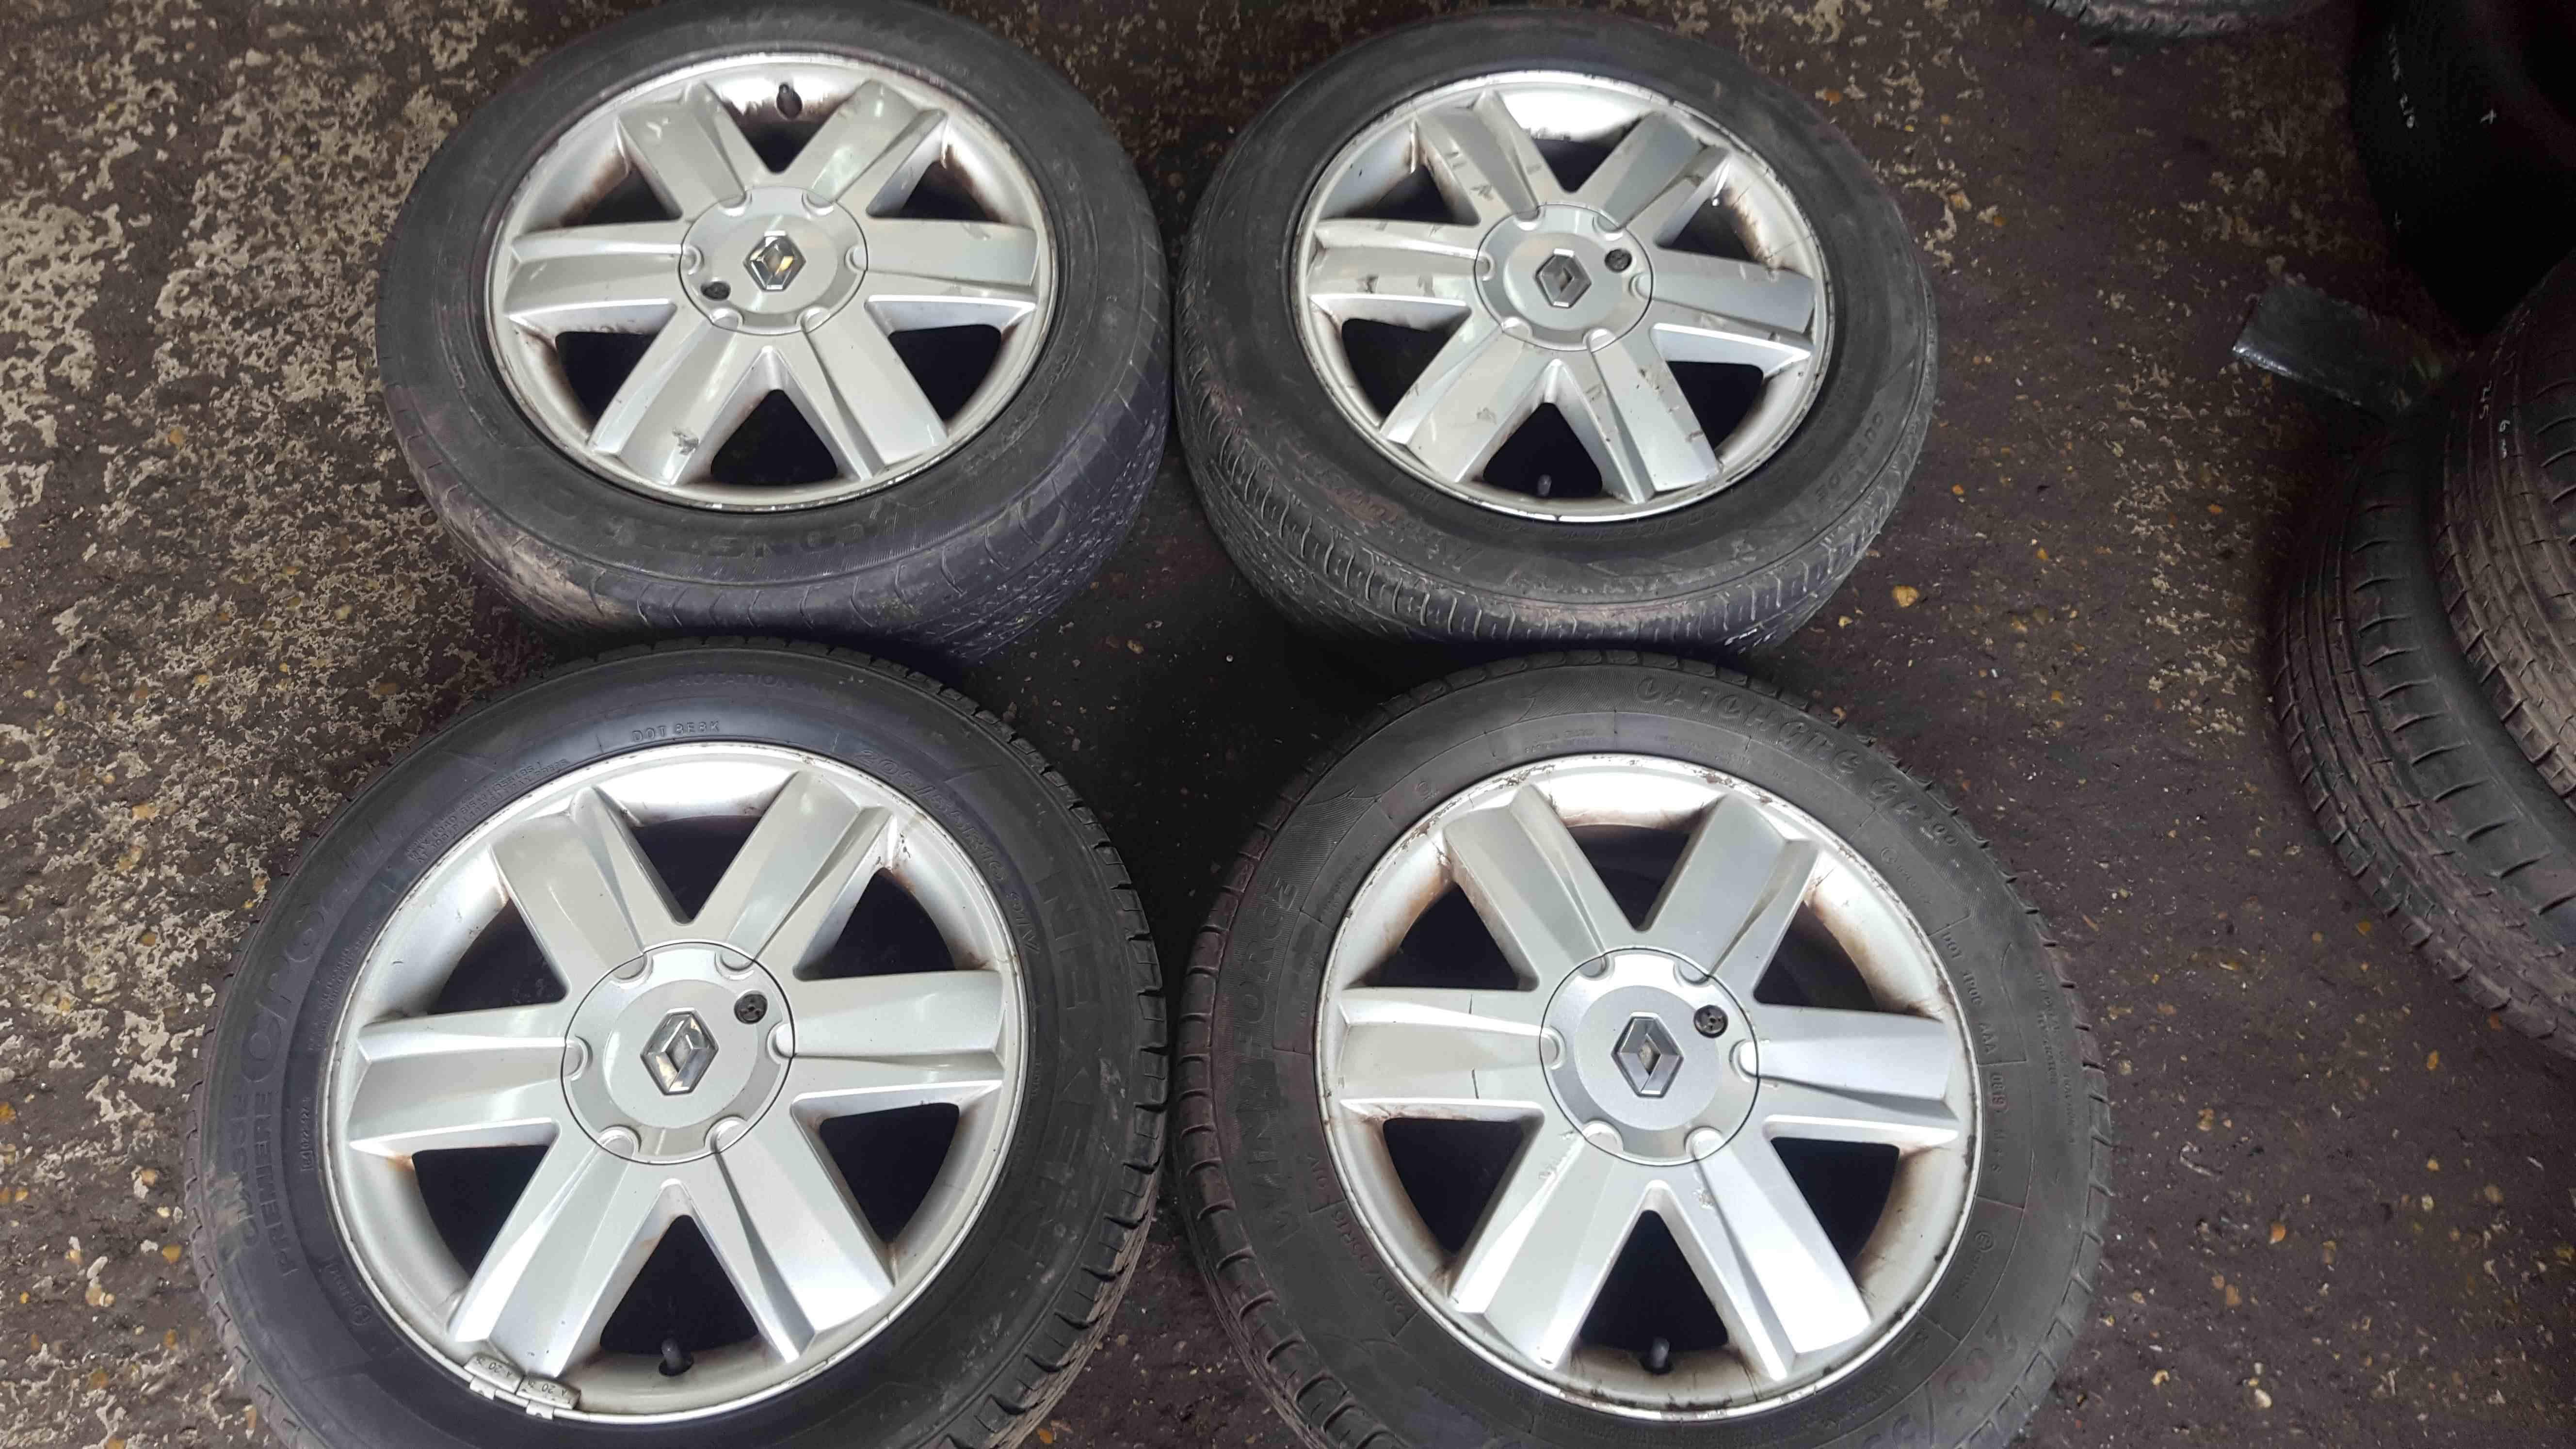 Renault Megane MK2 2002-2008 Nervastella Alloy Wheels Set X4 16inch